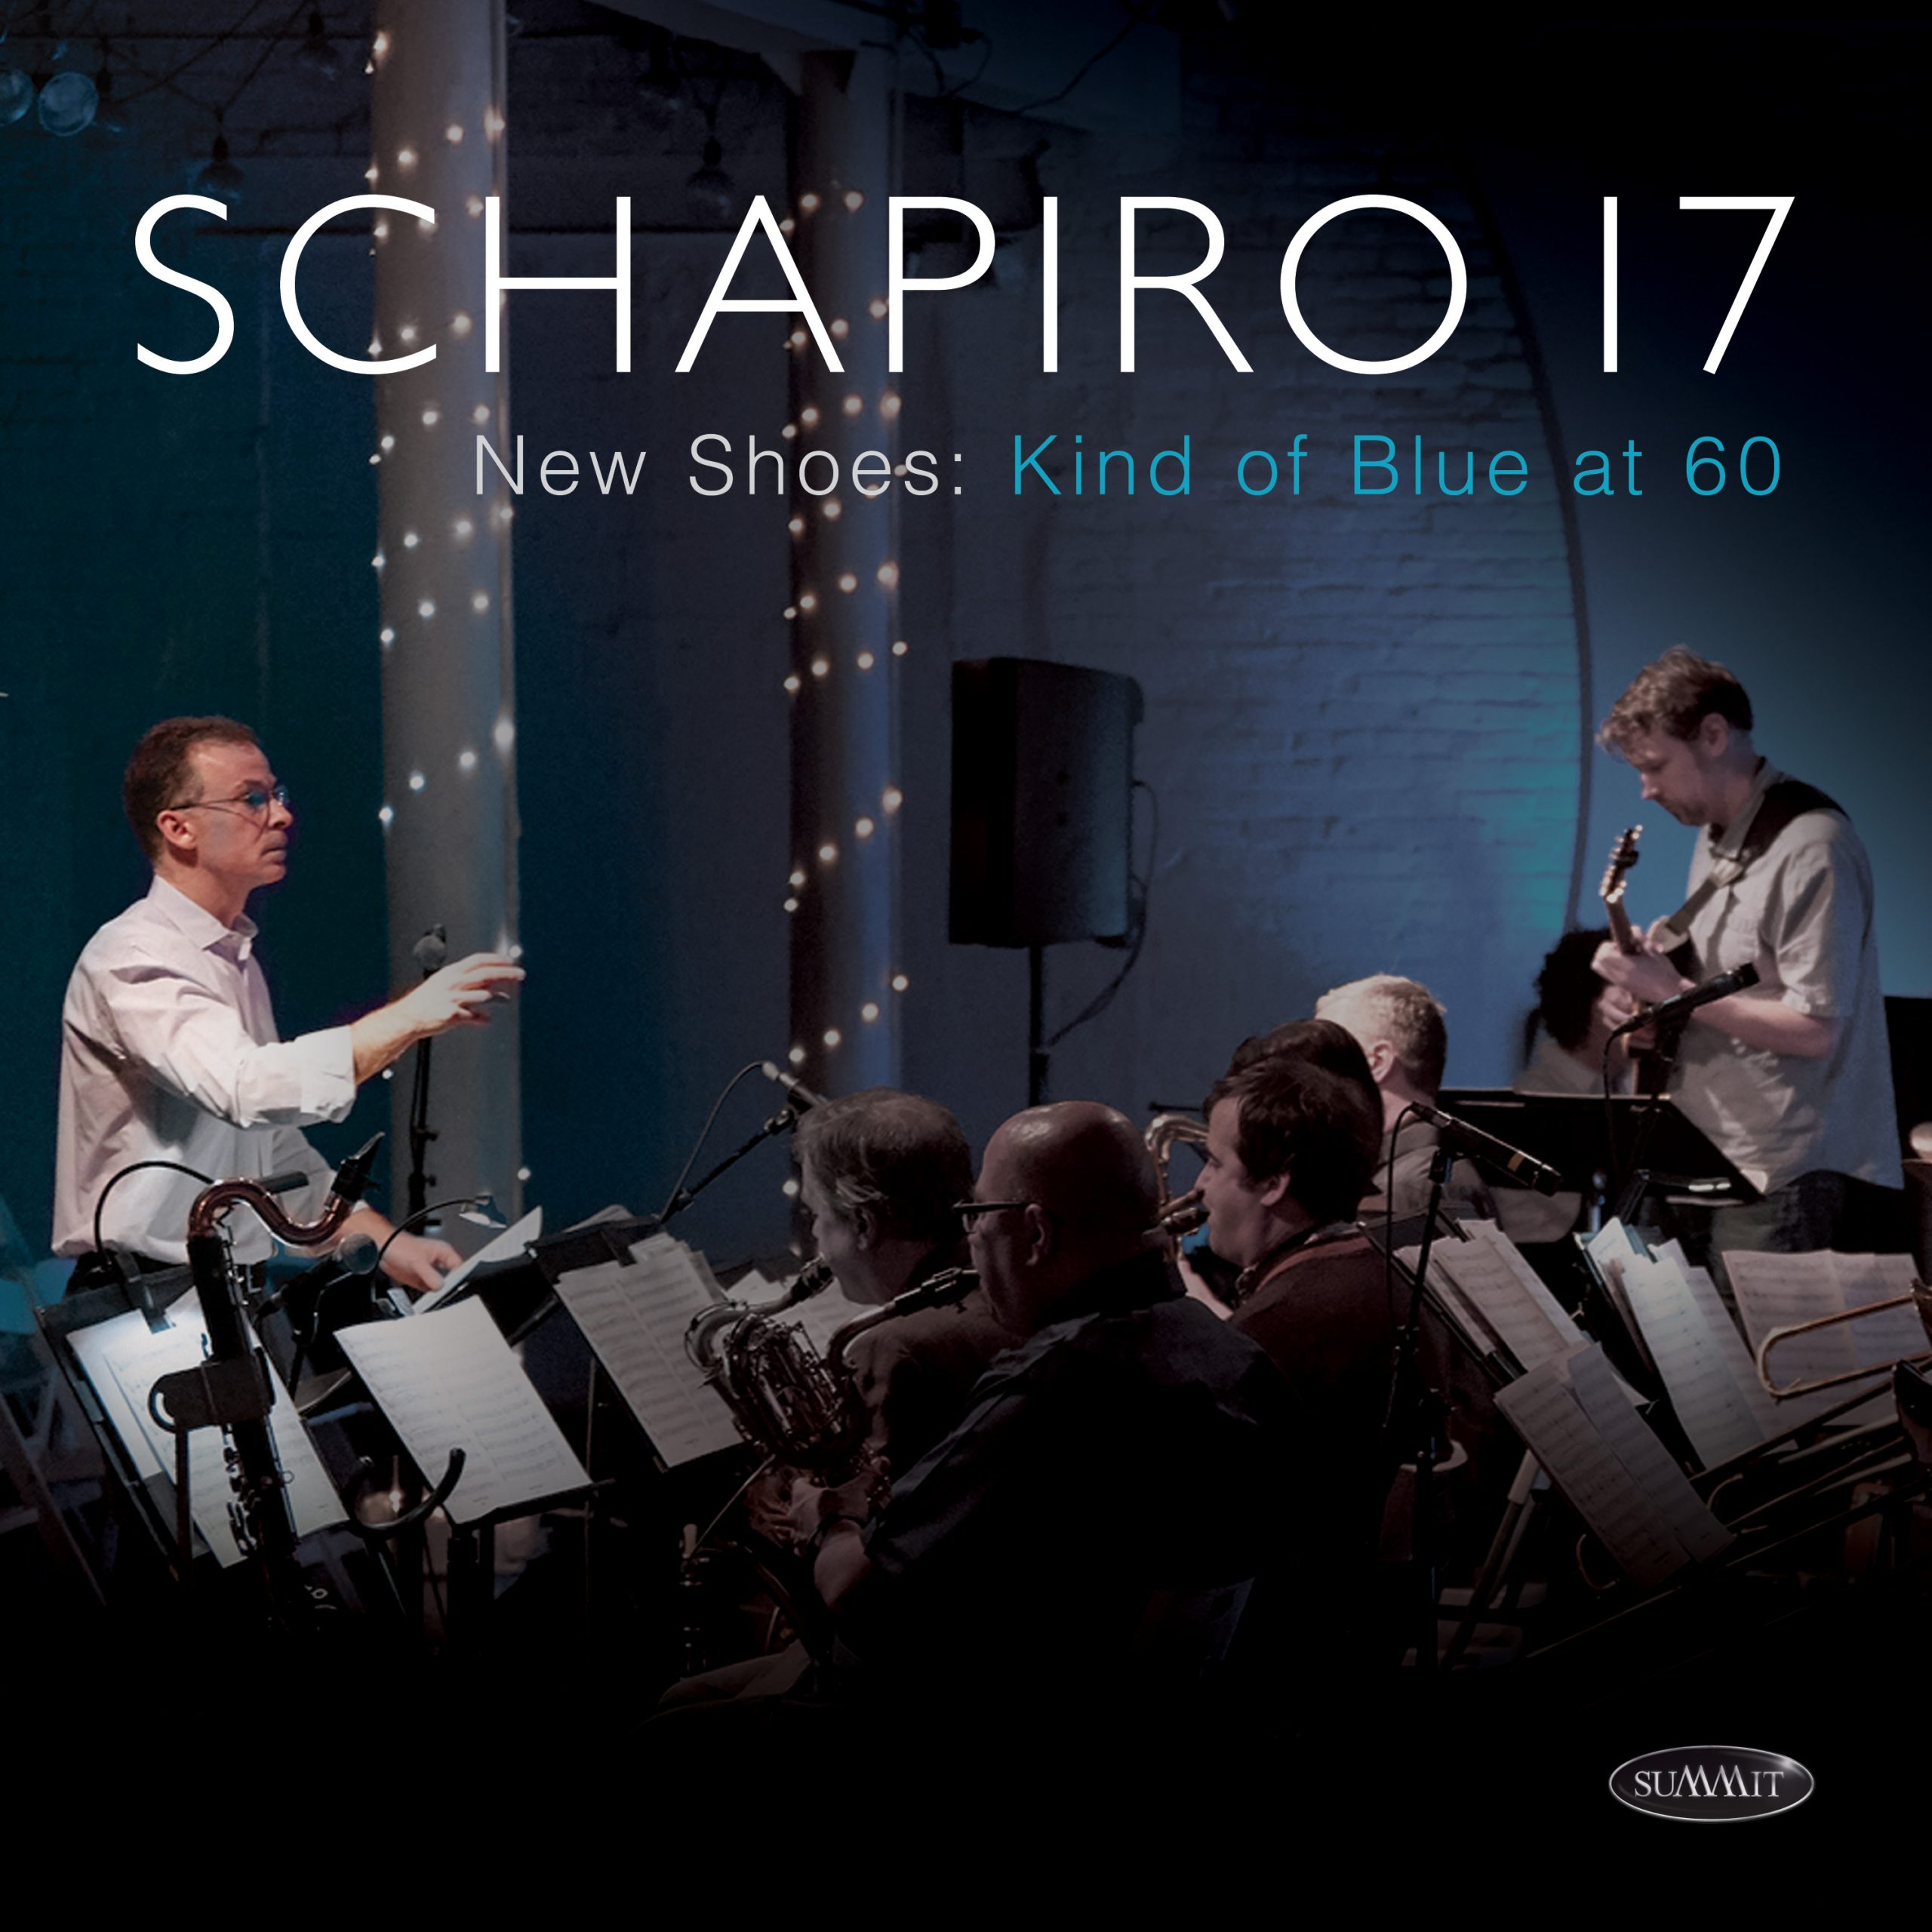 JON SCHAPIRO - New Shoes: Kind of Blue at 60 – Schapiro 17 cover